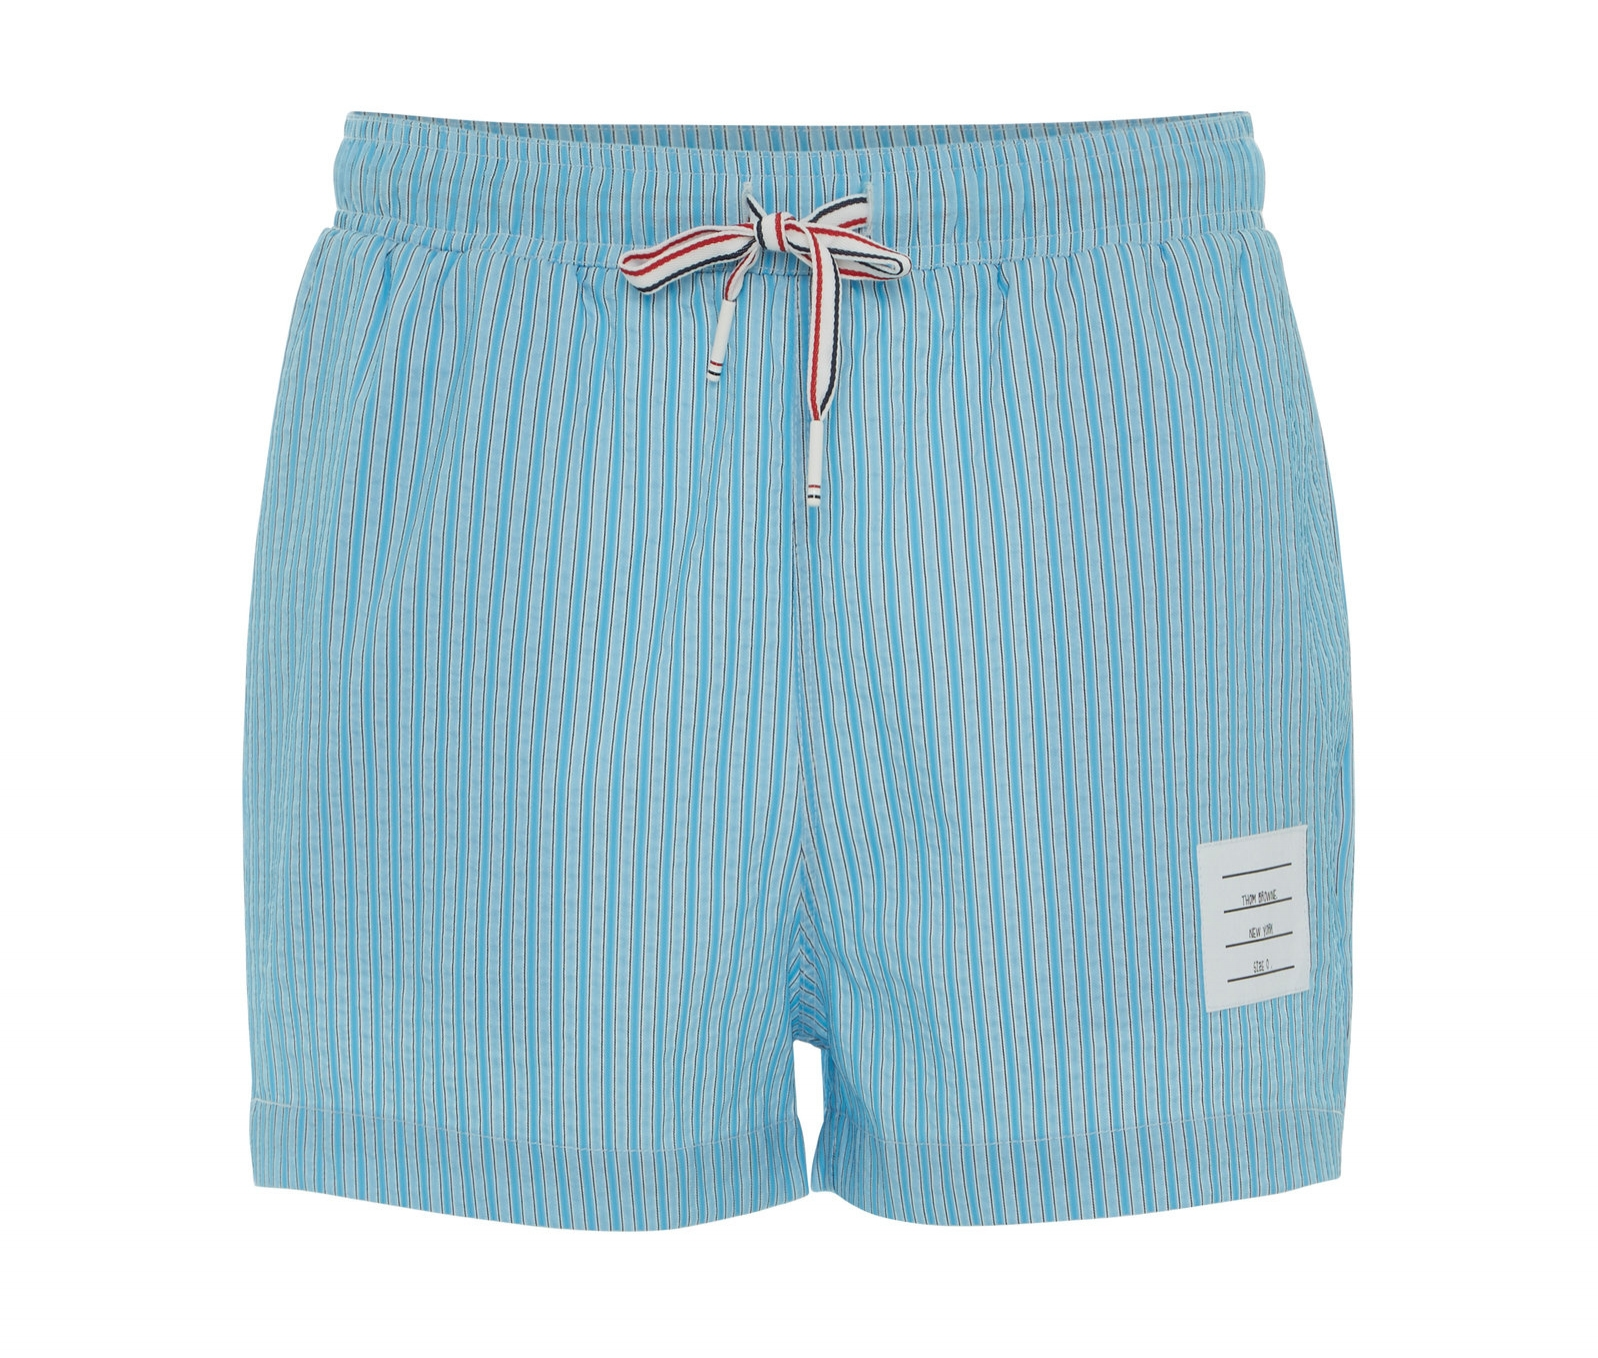 Striped Seersucker Swim Short – Thom Browne